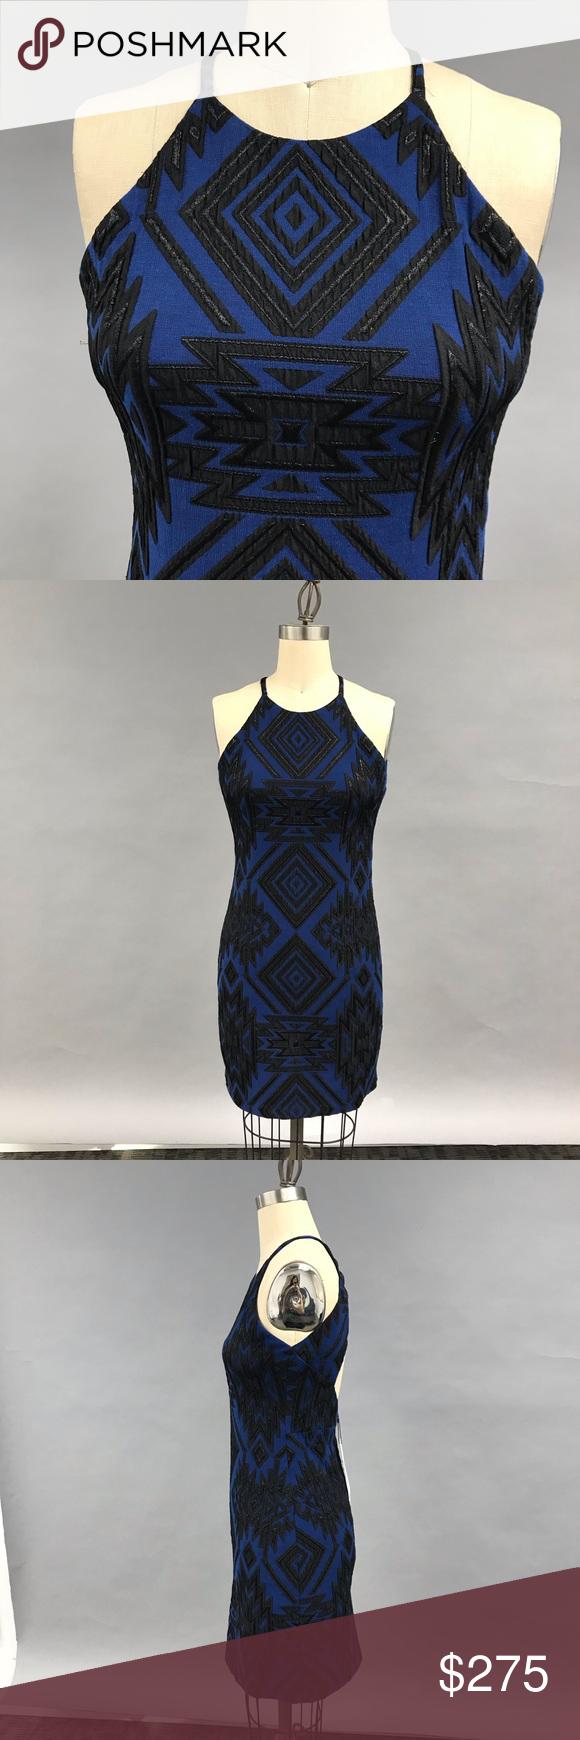 Parker Blue Brocade Mini Dress Nwt Clothes Design Fashion Parker Dress